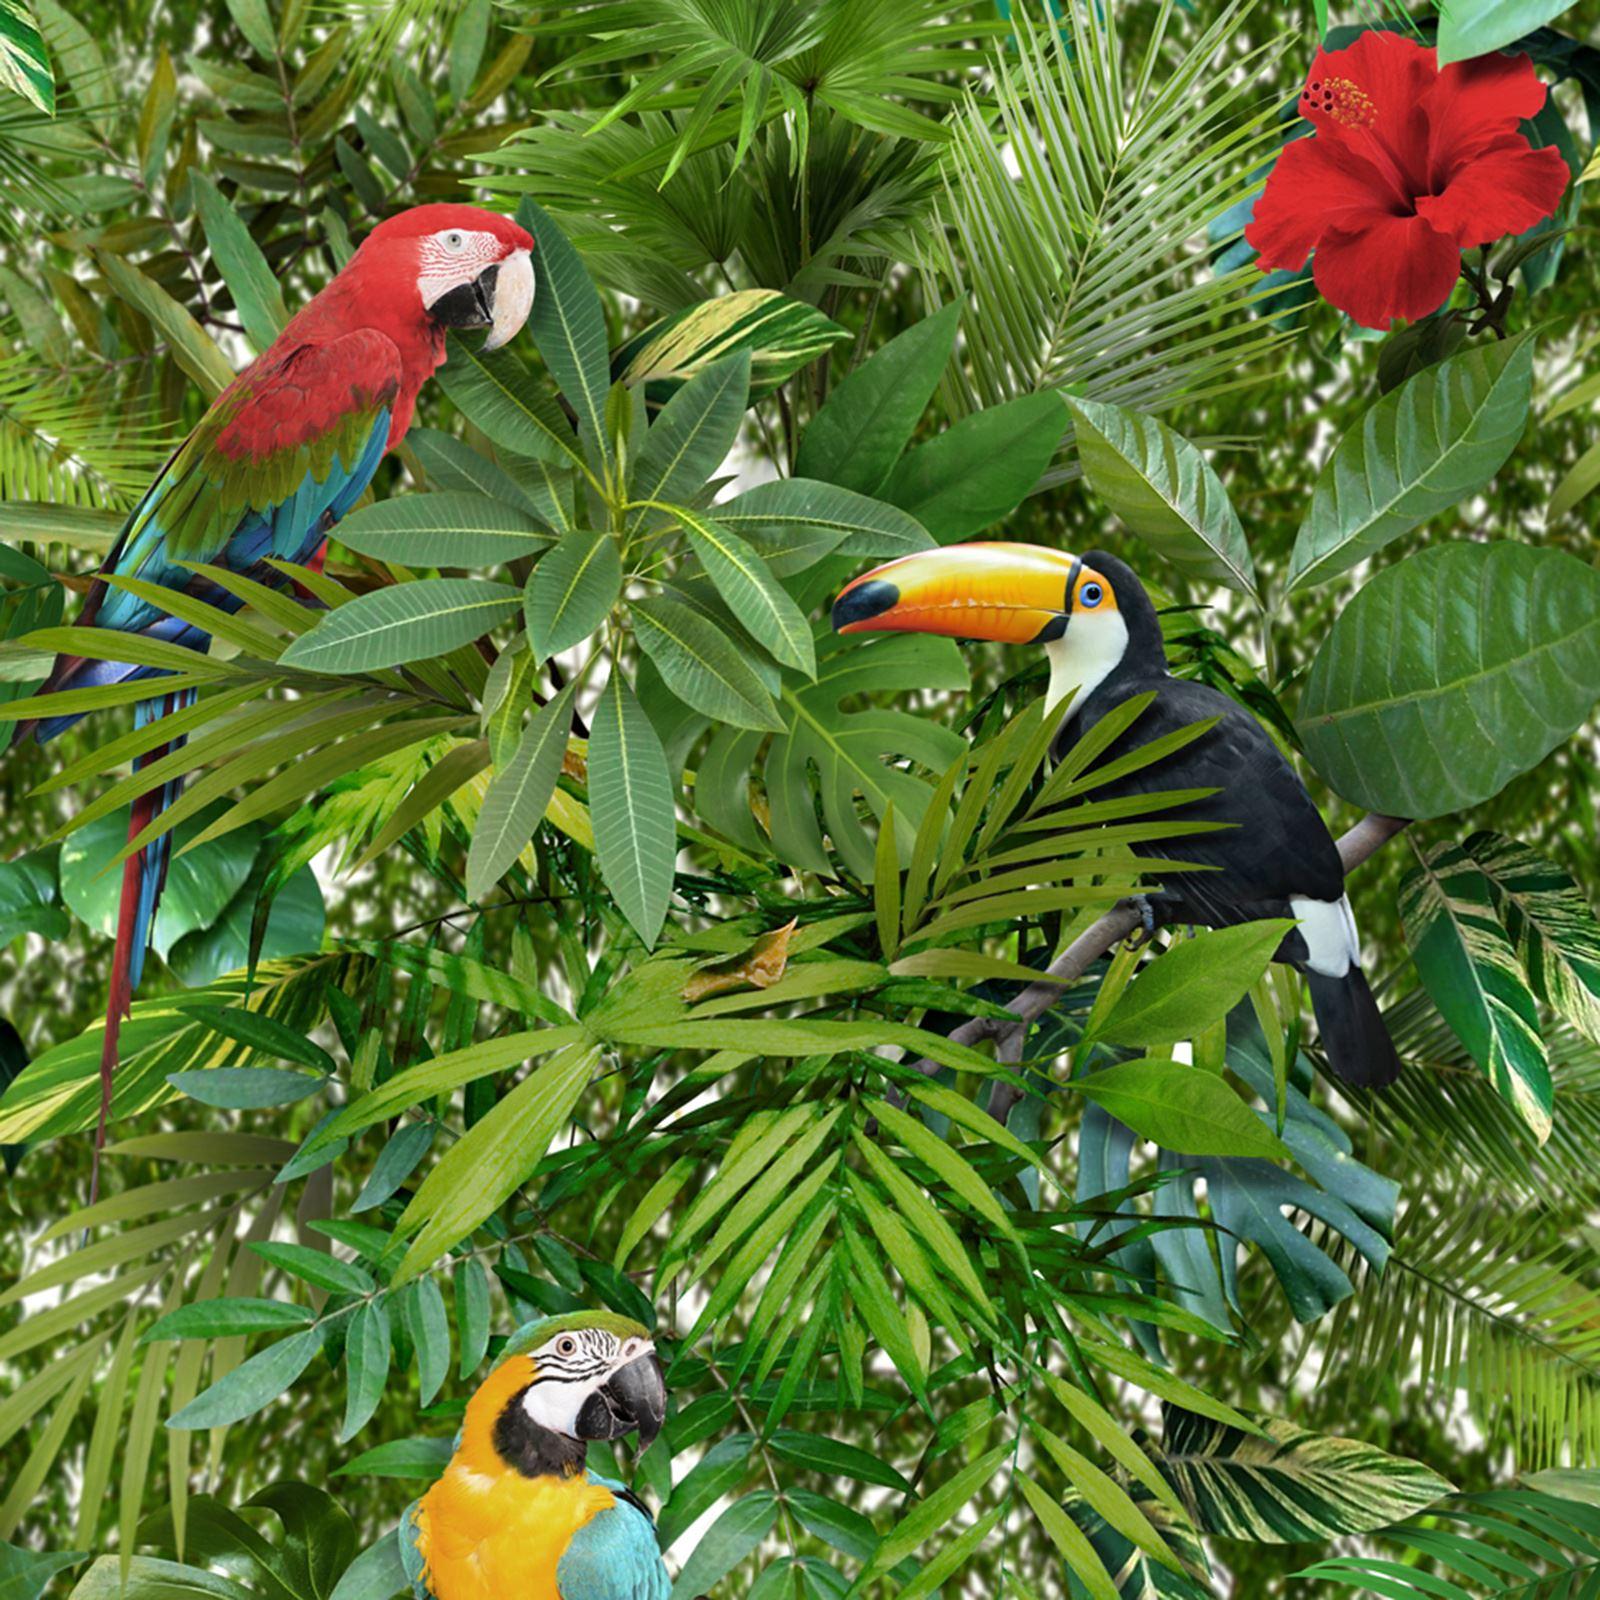 Dettagli su Giungla Tropicale Carta Da Parati Muriva 102555 nuova 1600x1600